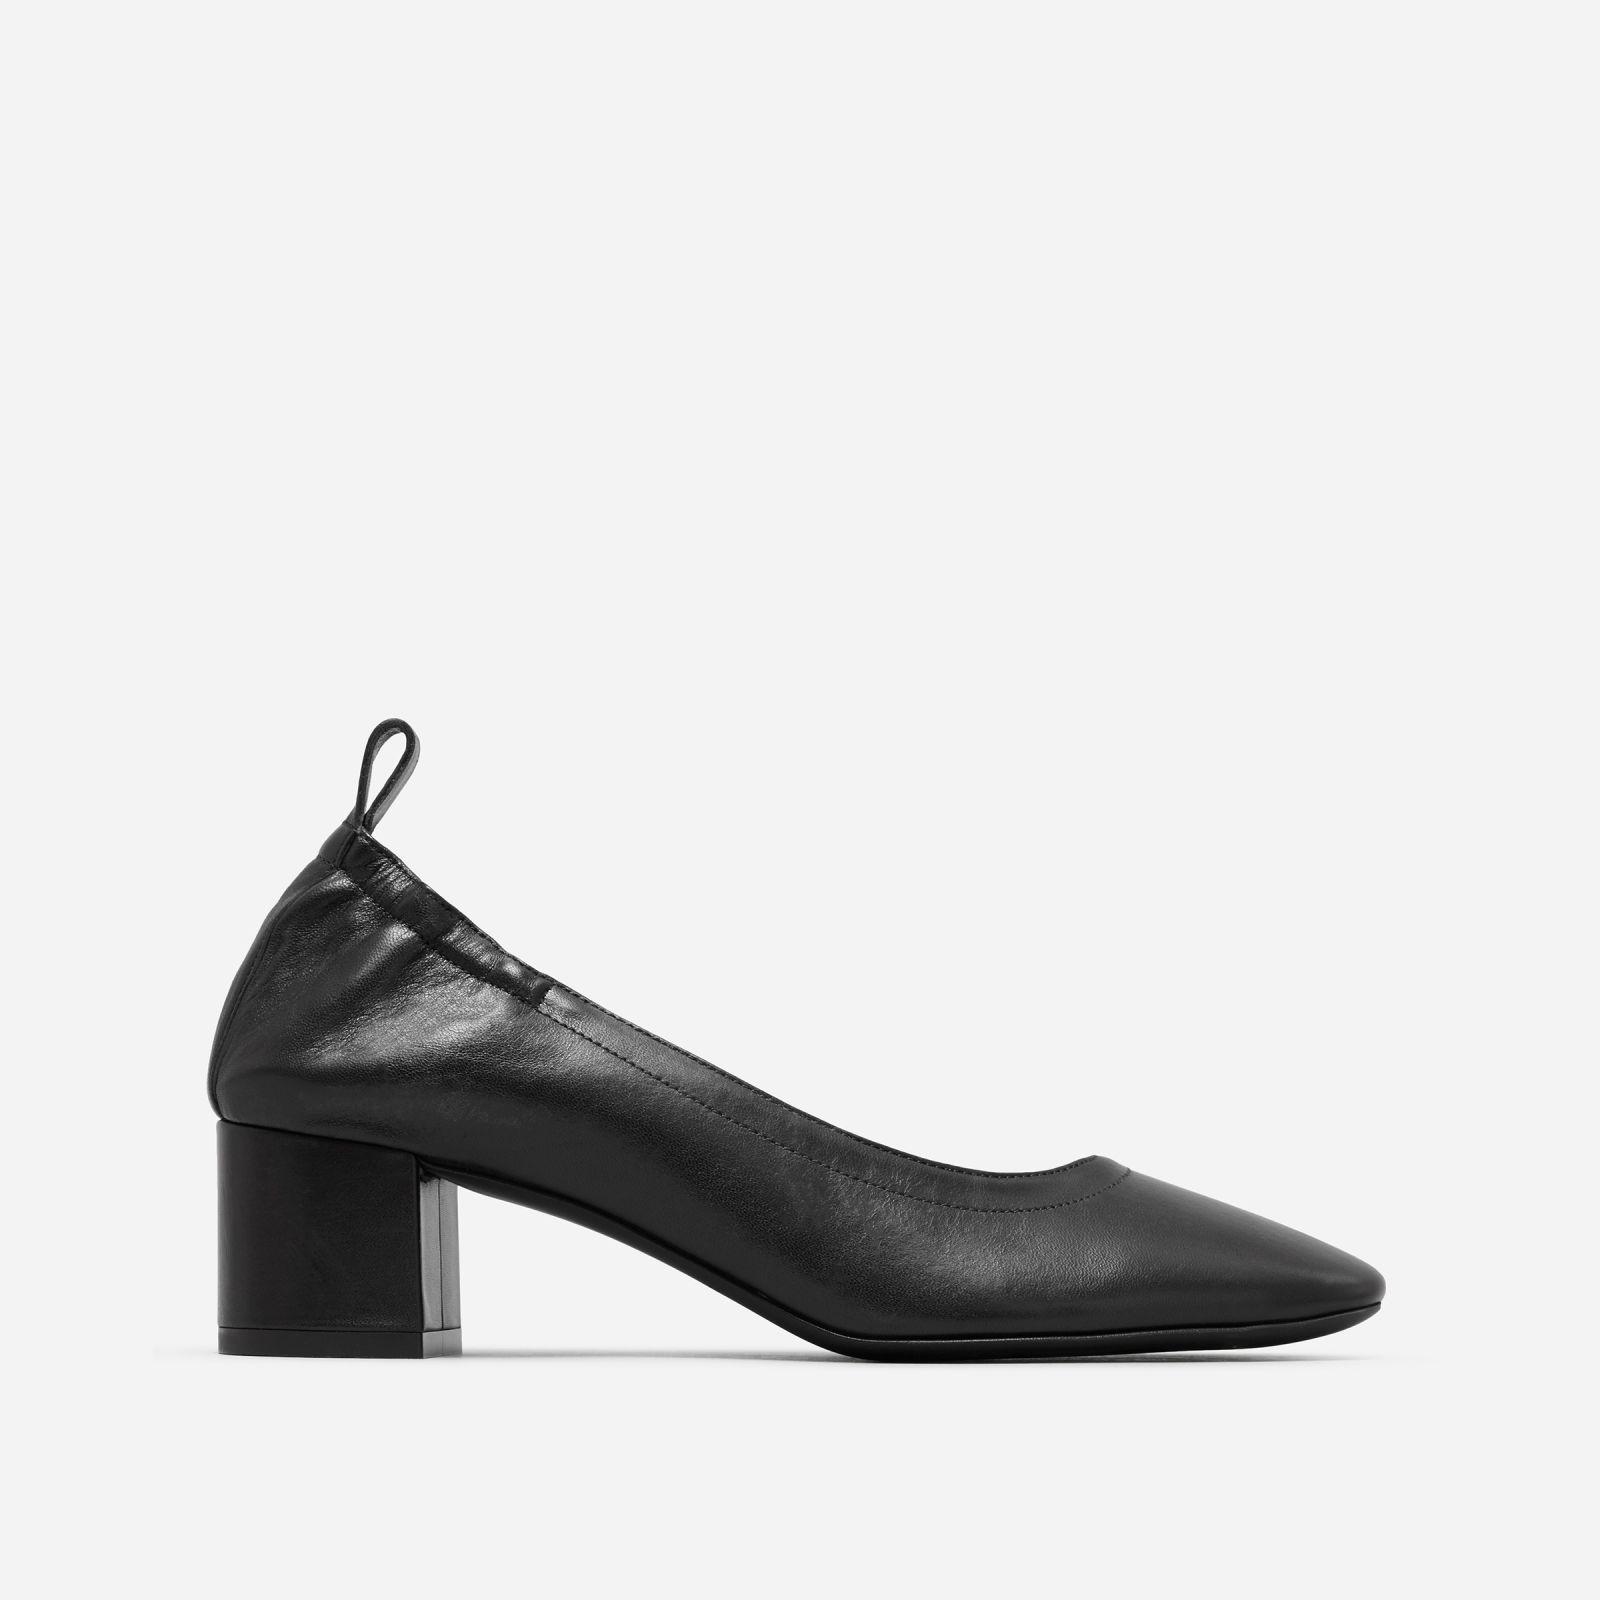 women's leather block heel pump by everlane in black, size 11